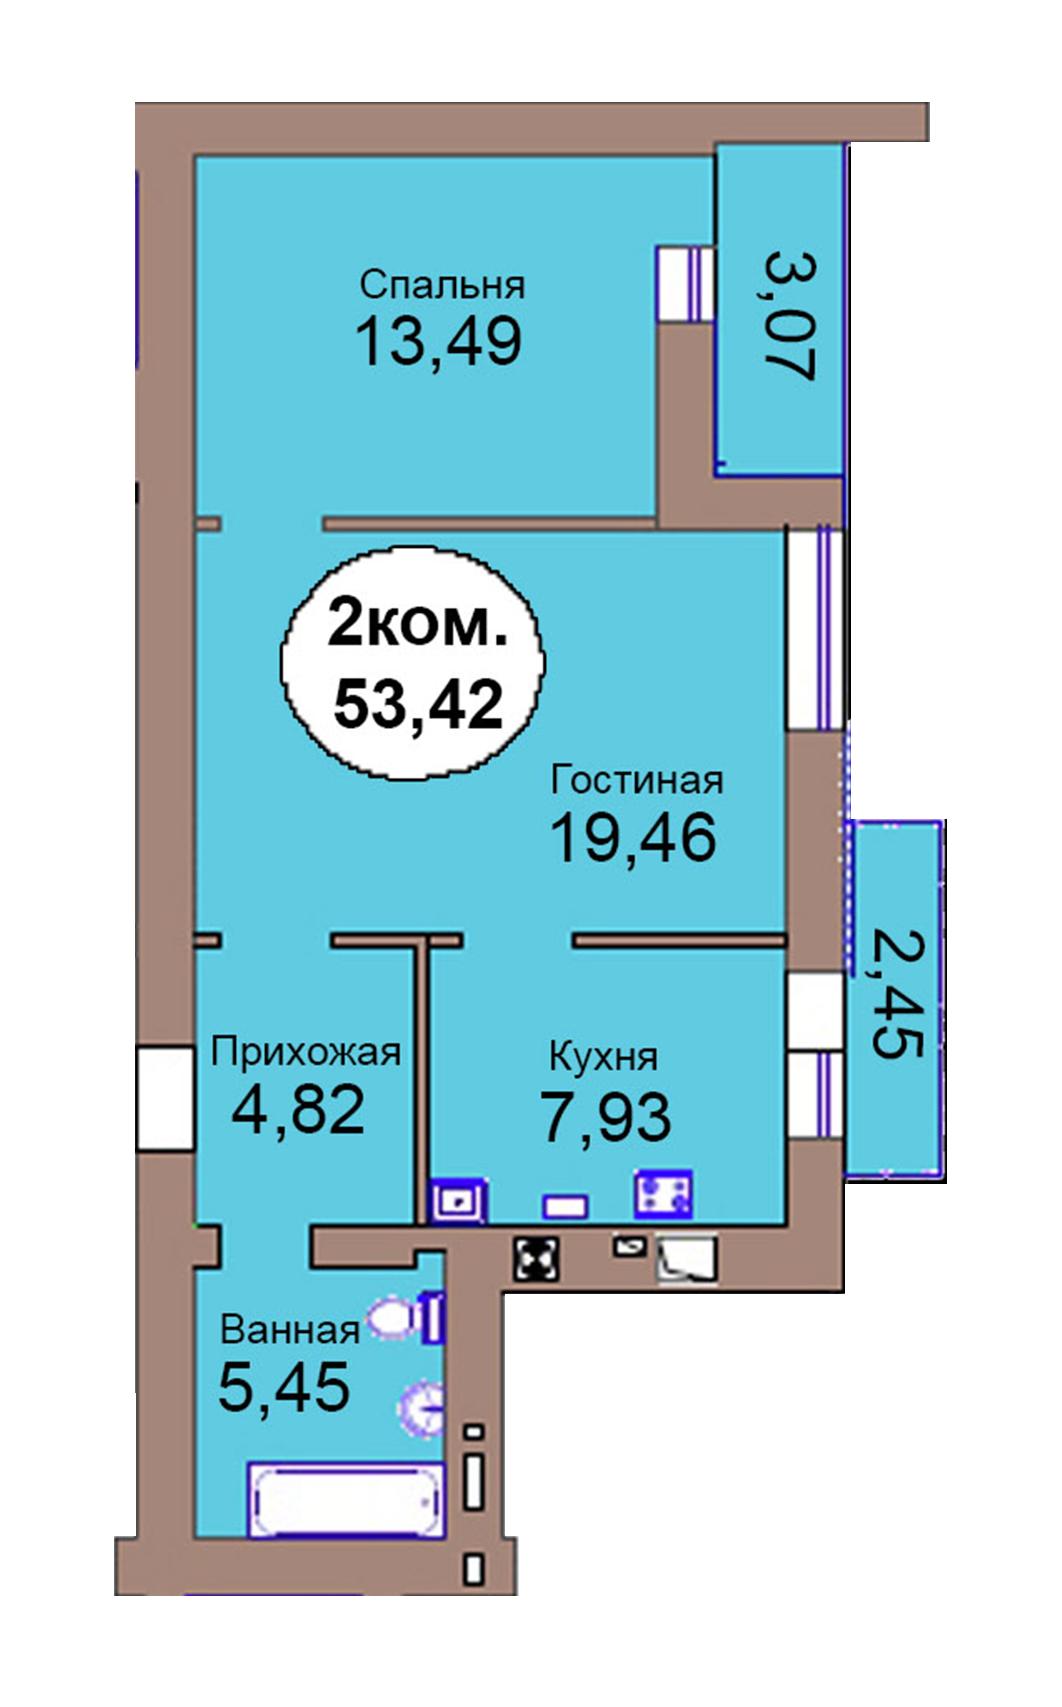 2-комн. кв. по пер. Калининградский, 4  кв. 102 в Калининграде